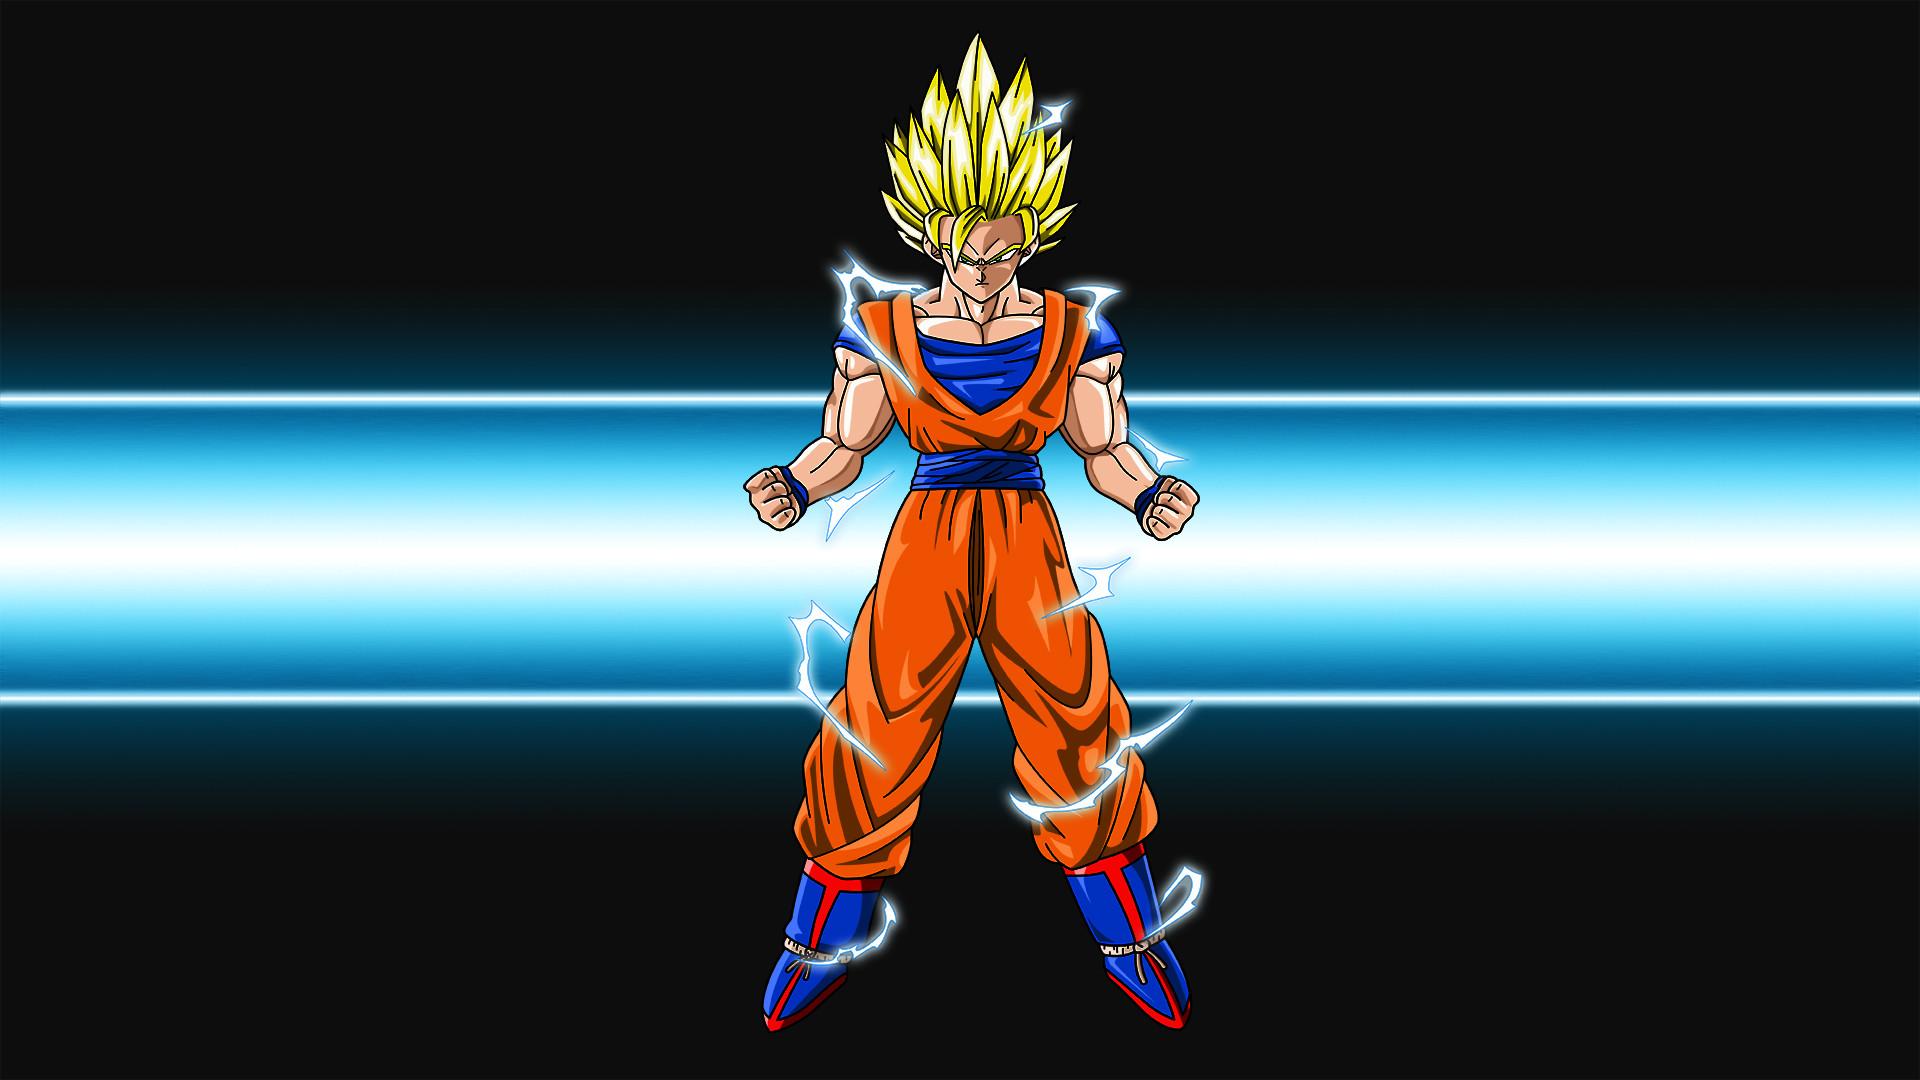 Goku Super Saiyan Dragon Ball Wallpaper HD #6908842